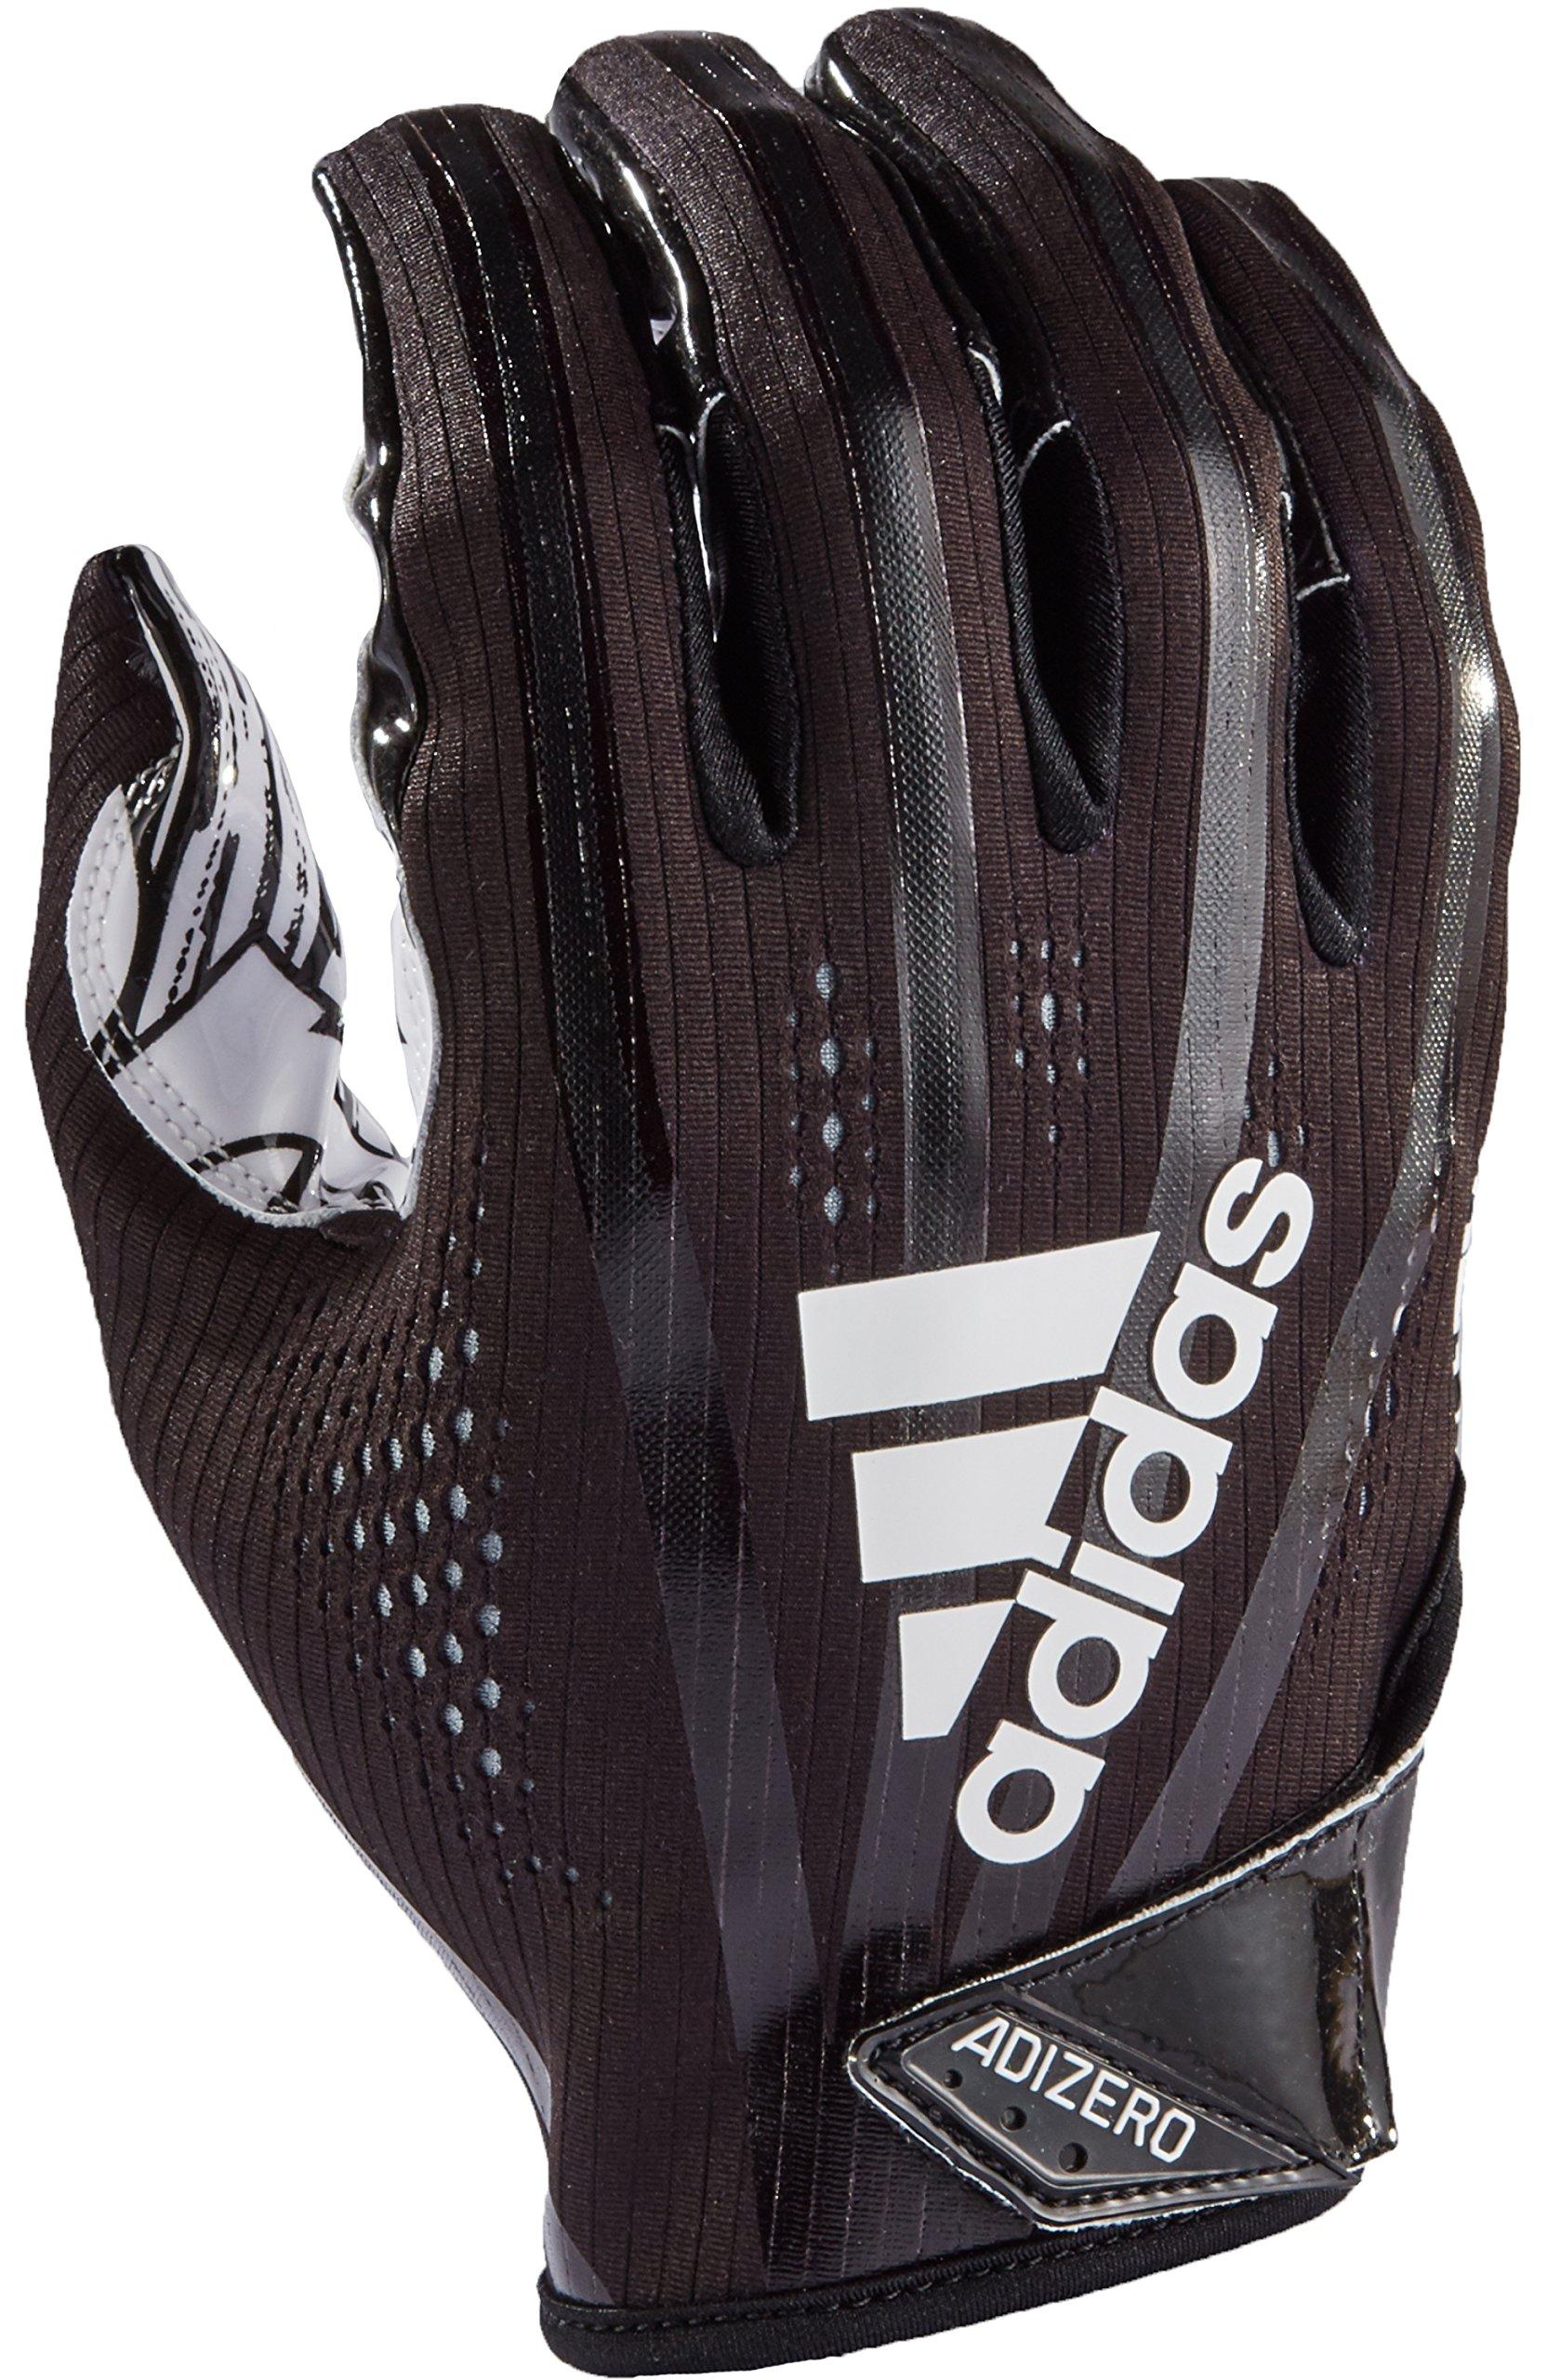 adidas AF1000 Adizero 7.0 Receiver's Gloves, Black, Medium by adidas (Image #1)